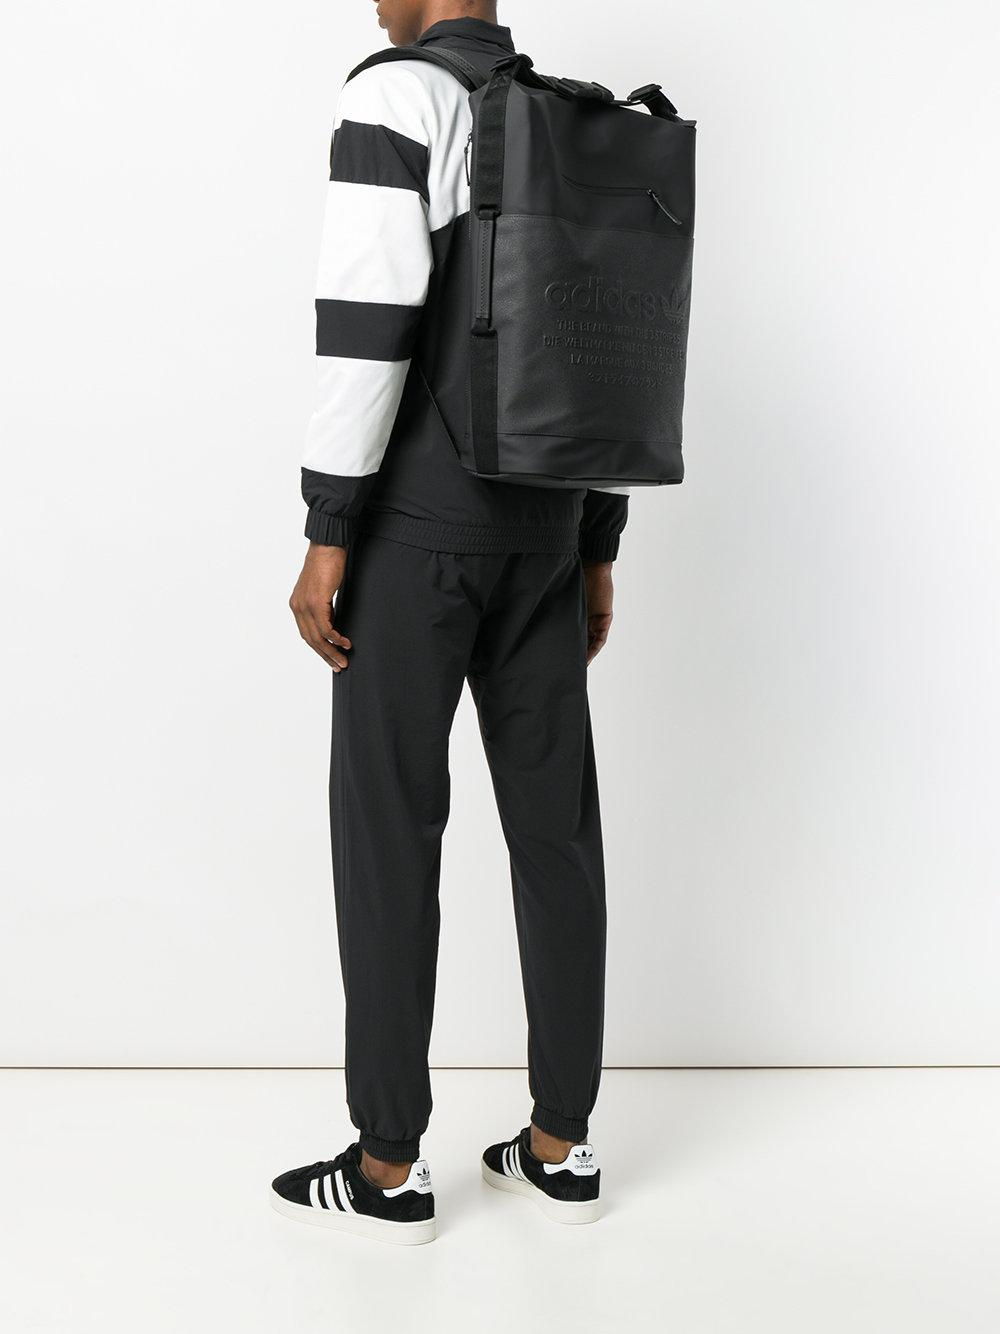 Lyst - adidas Nmd Backpack in Black for Men 8ffa81ca1748b